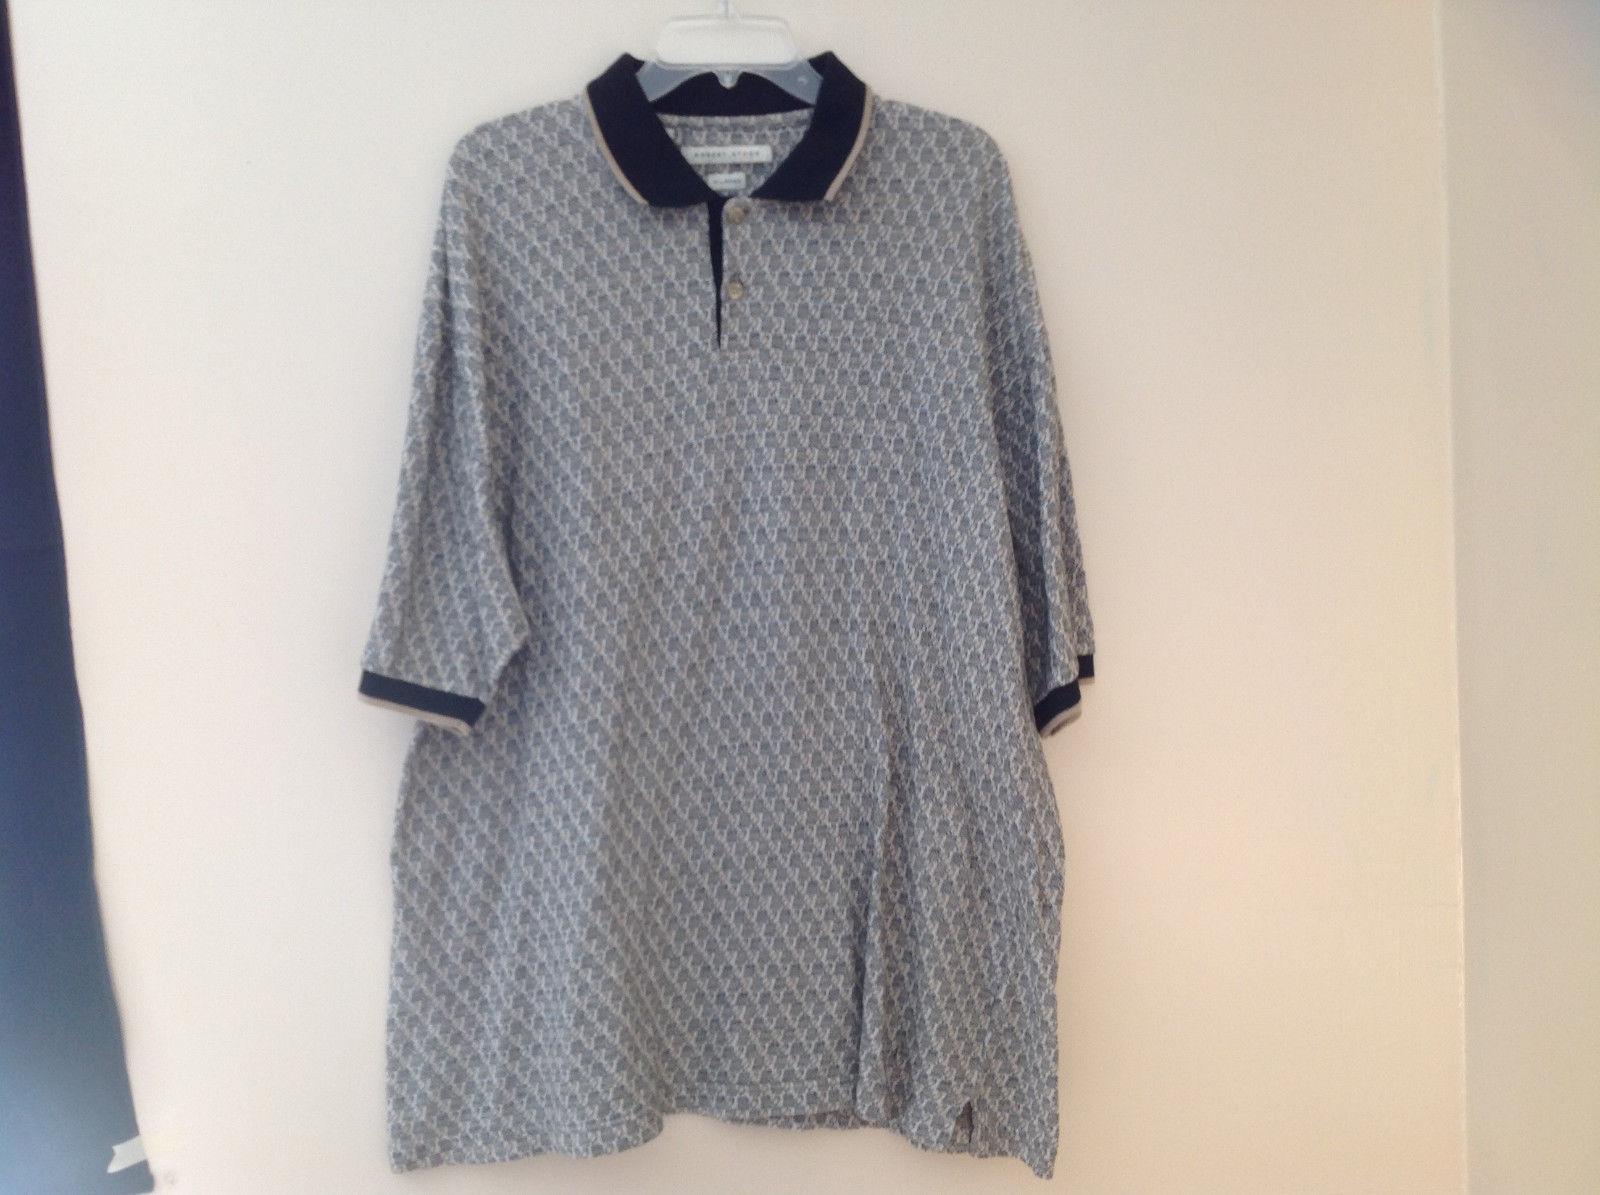 Robert Stock Black Tan Patterned Button Up Polo Short Sleeve Shirt Size XL